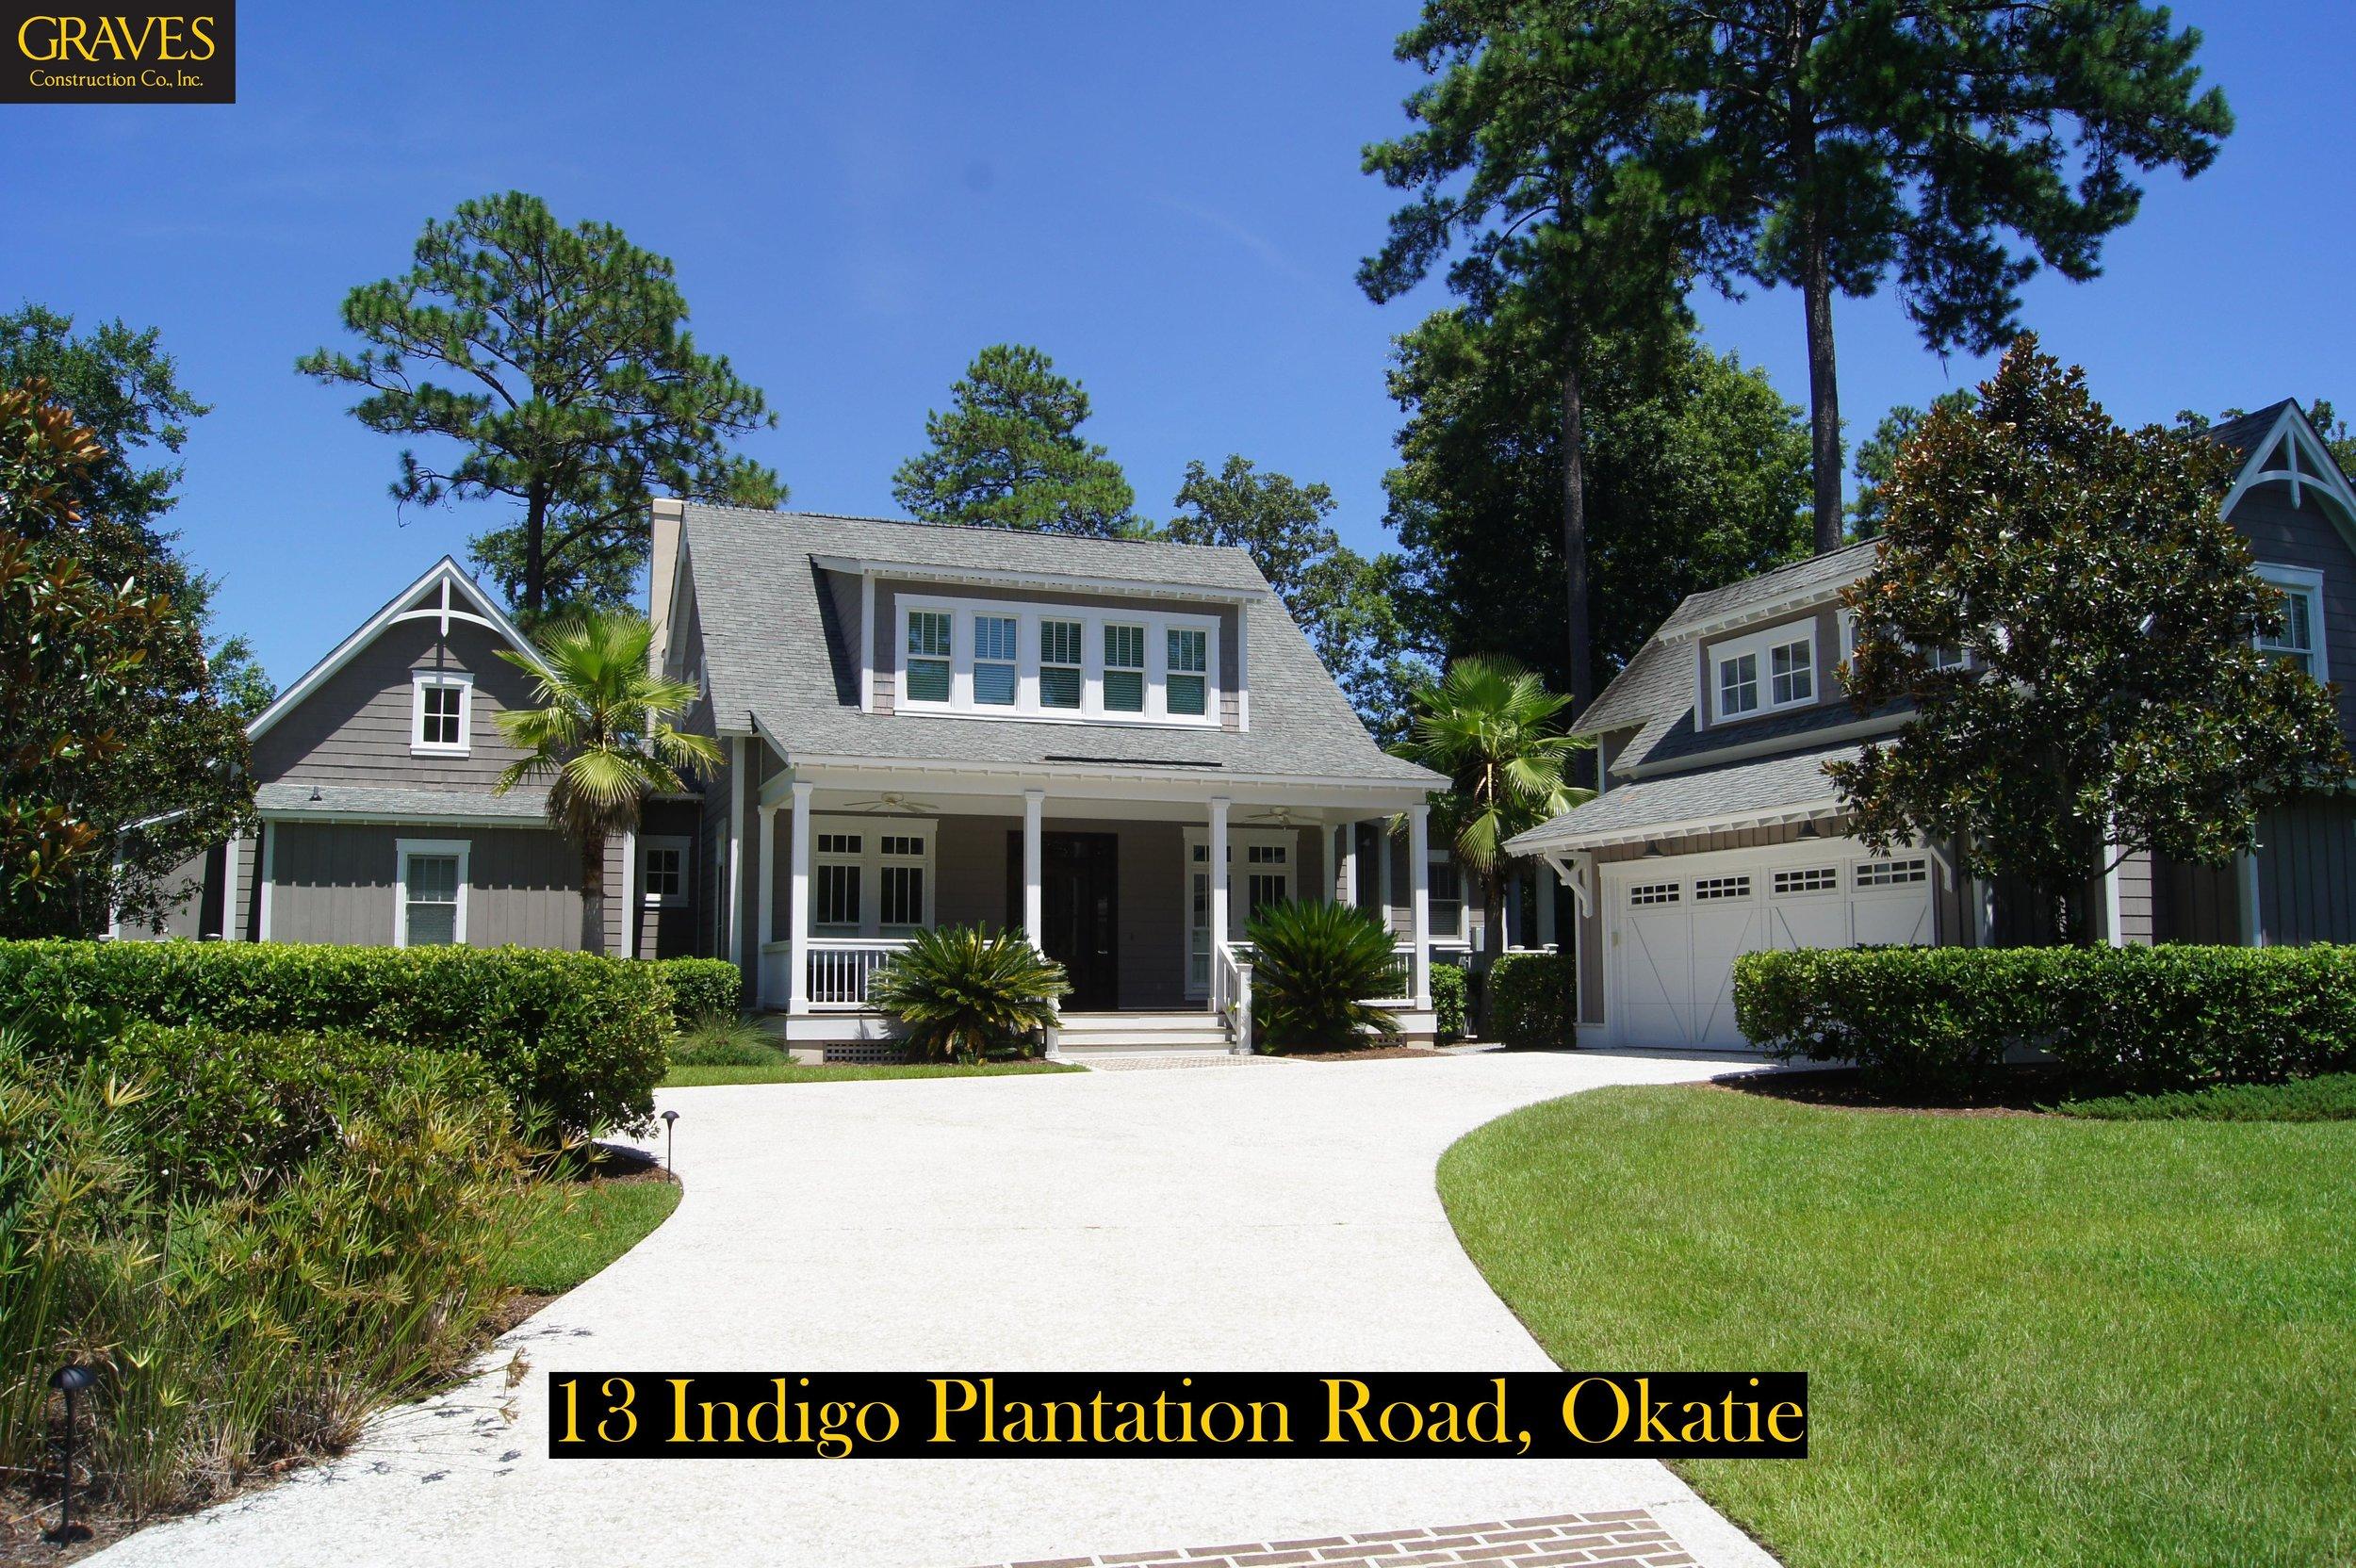 13 Indigo Plantation Rd - 1